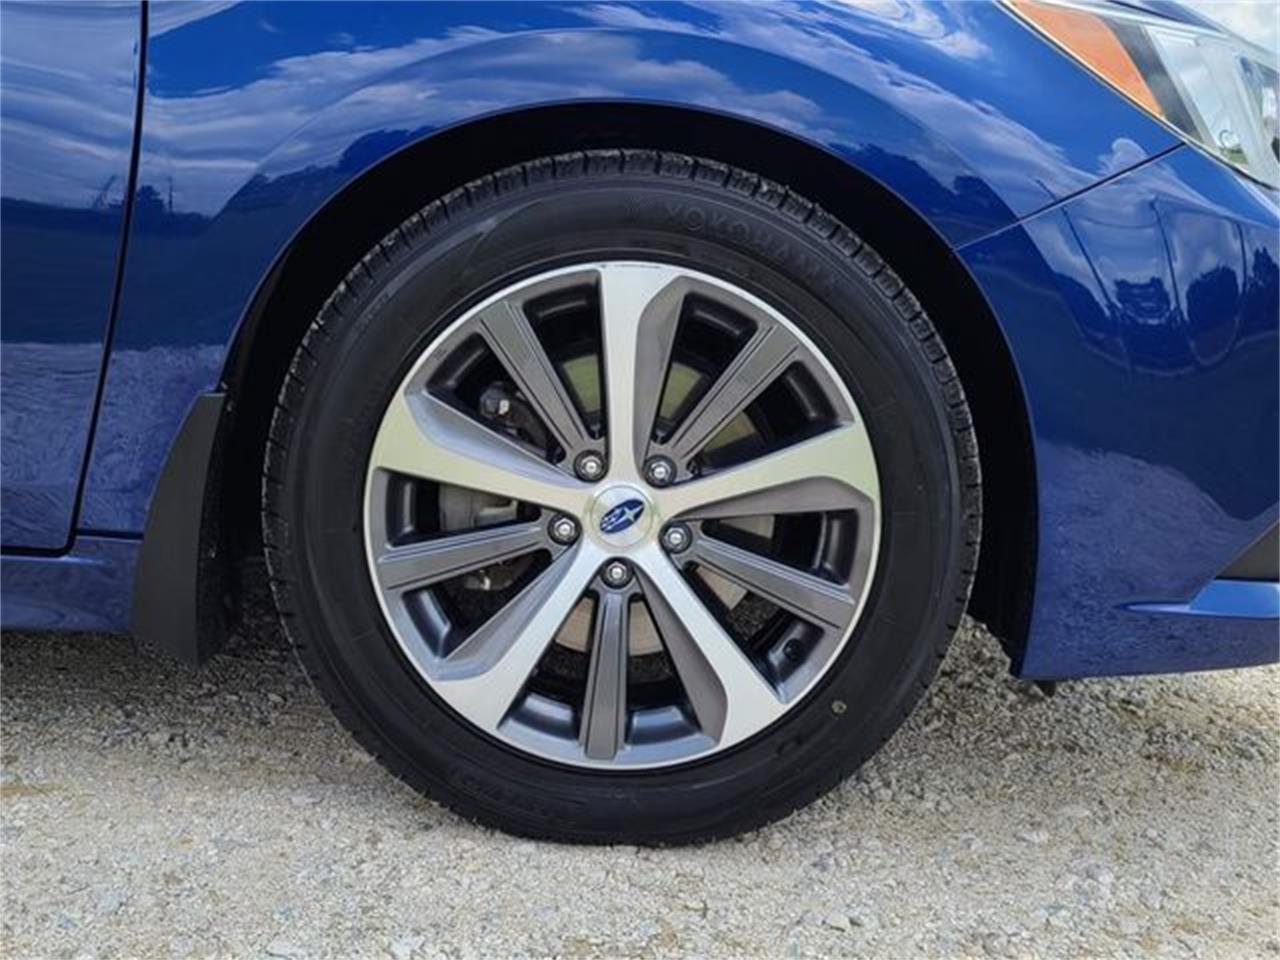 2016 Subaru Legacy (CC-1369376) for sale in Hope Mills, North Carolina